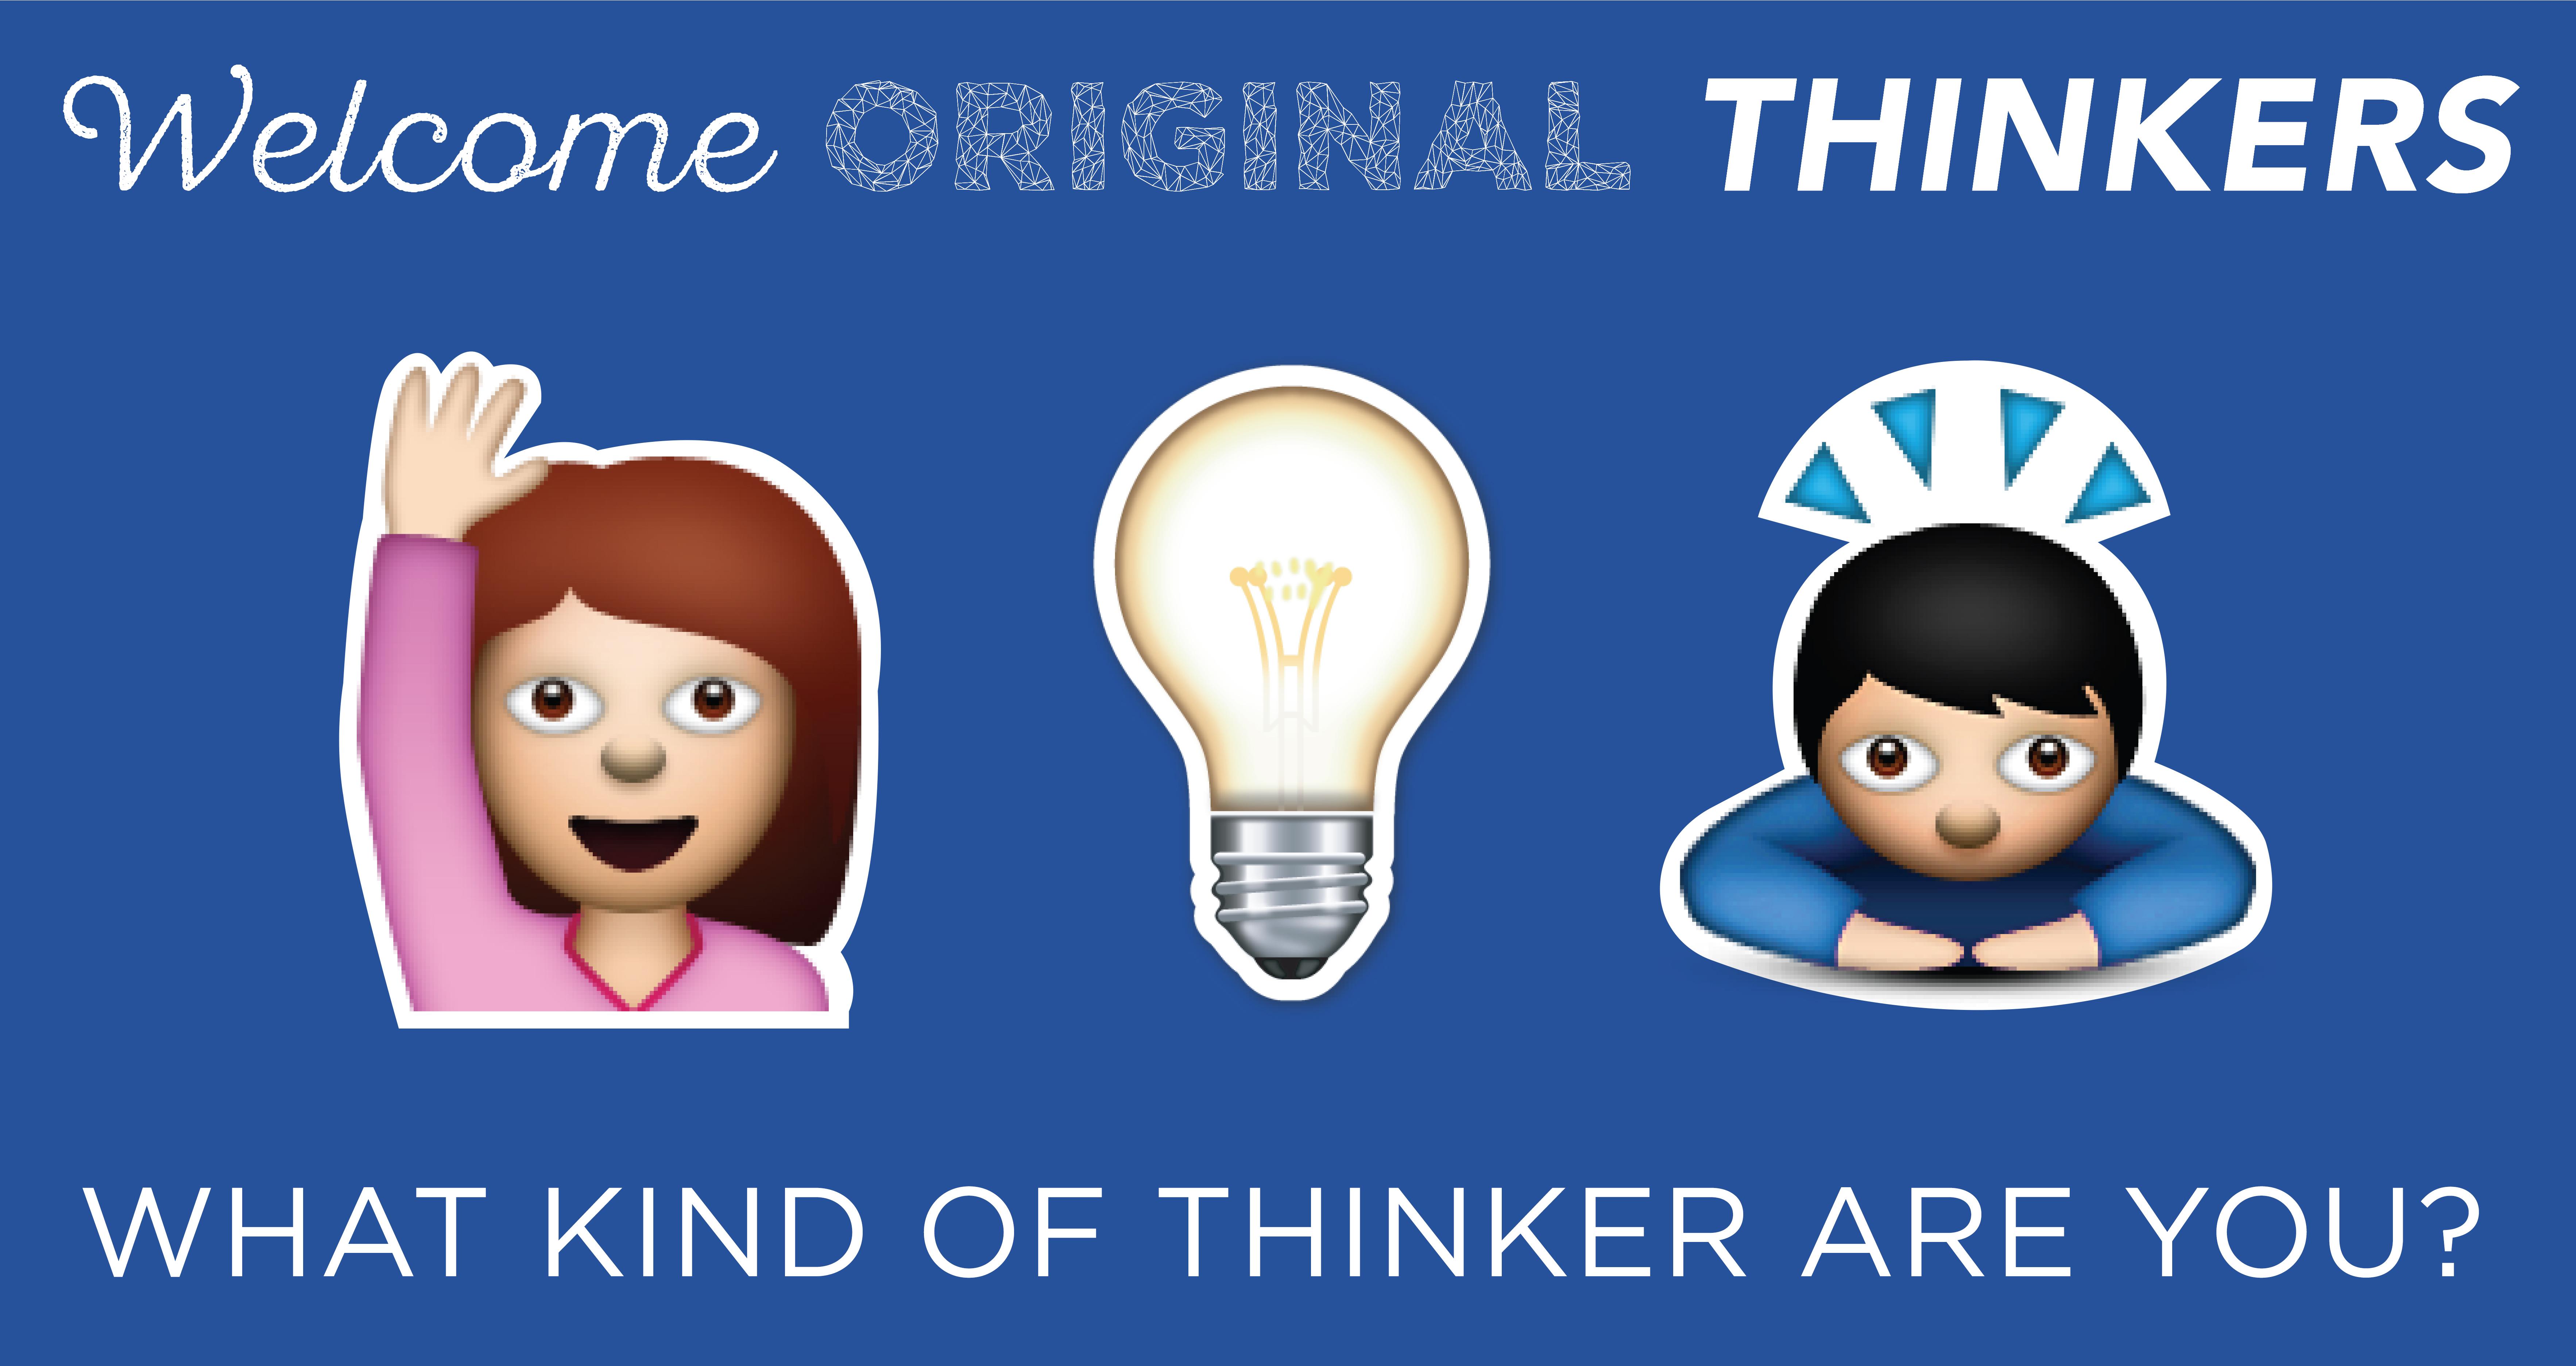 Kimberly-Clark uses social quiz to woo talent